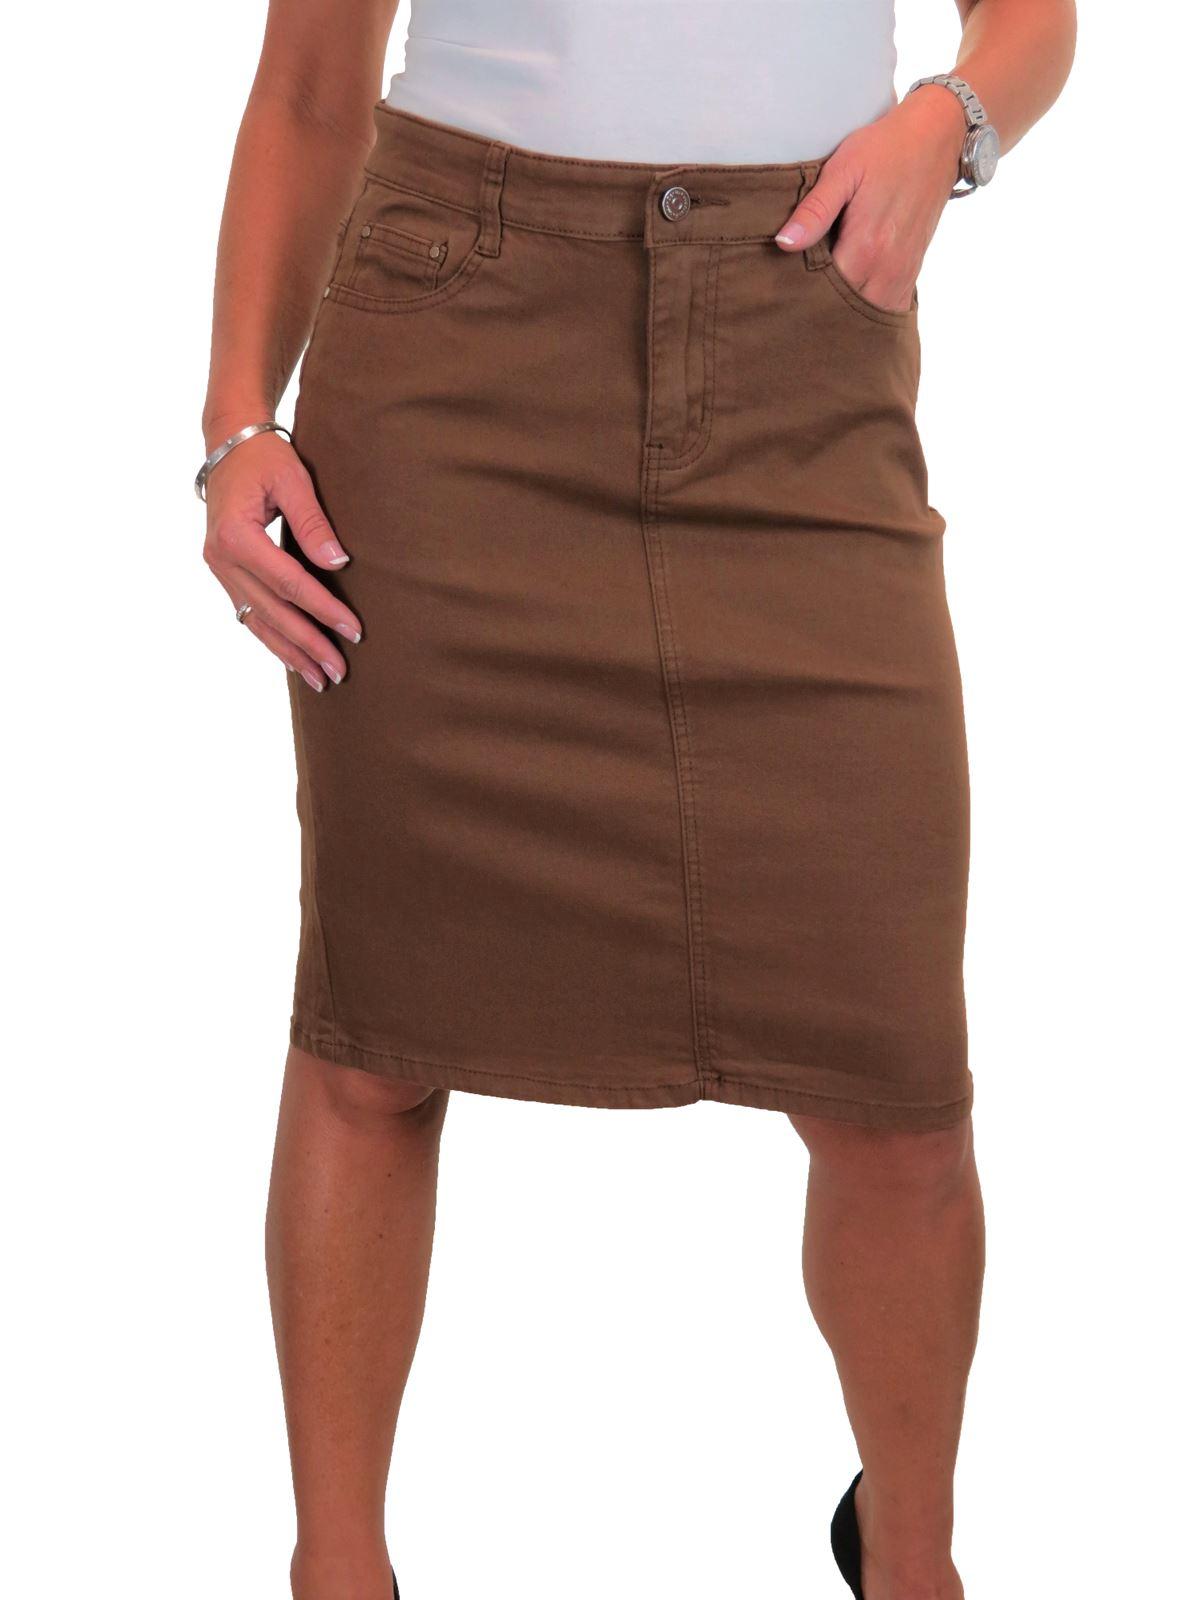 ICE-Womens-Good-Stretch-Jeans-Skirt-Knee-Length-14-22 thumbnail 9